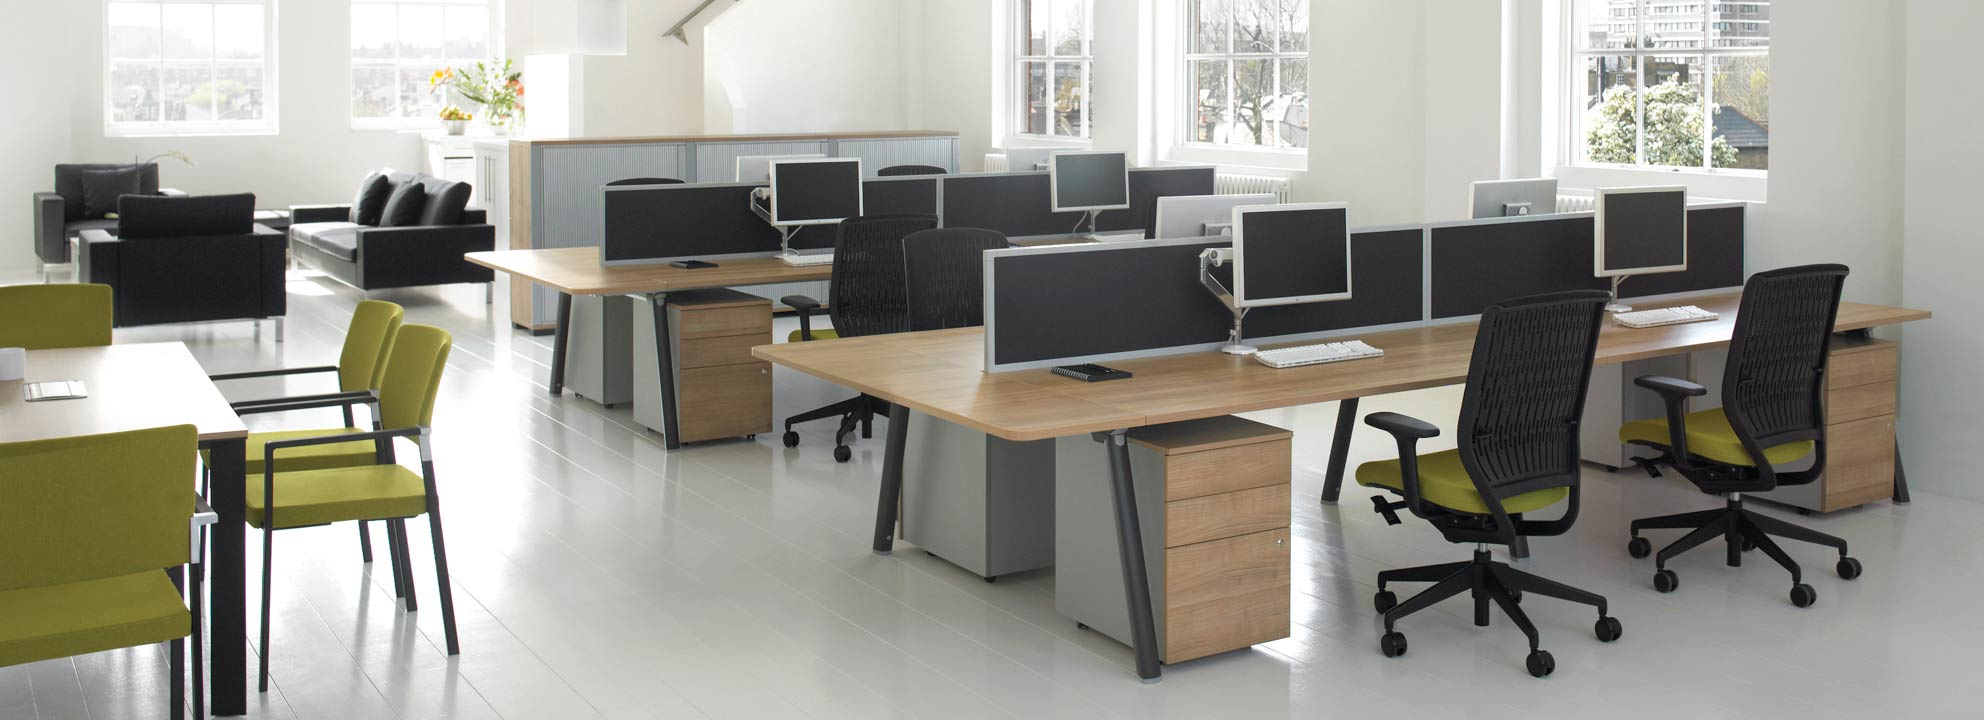 Senator Office Furniture Suppliers Home Office Furniture